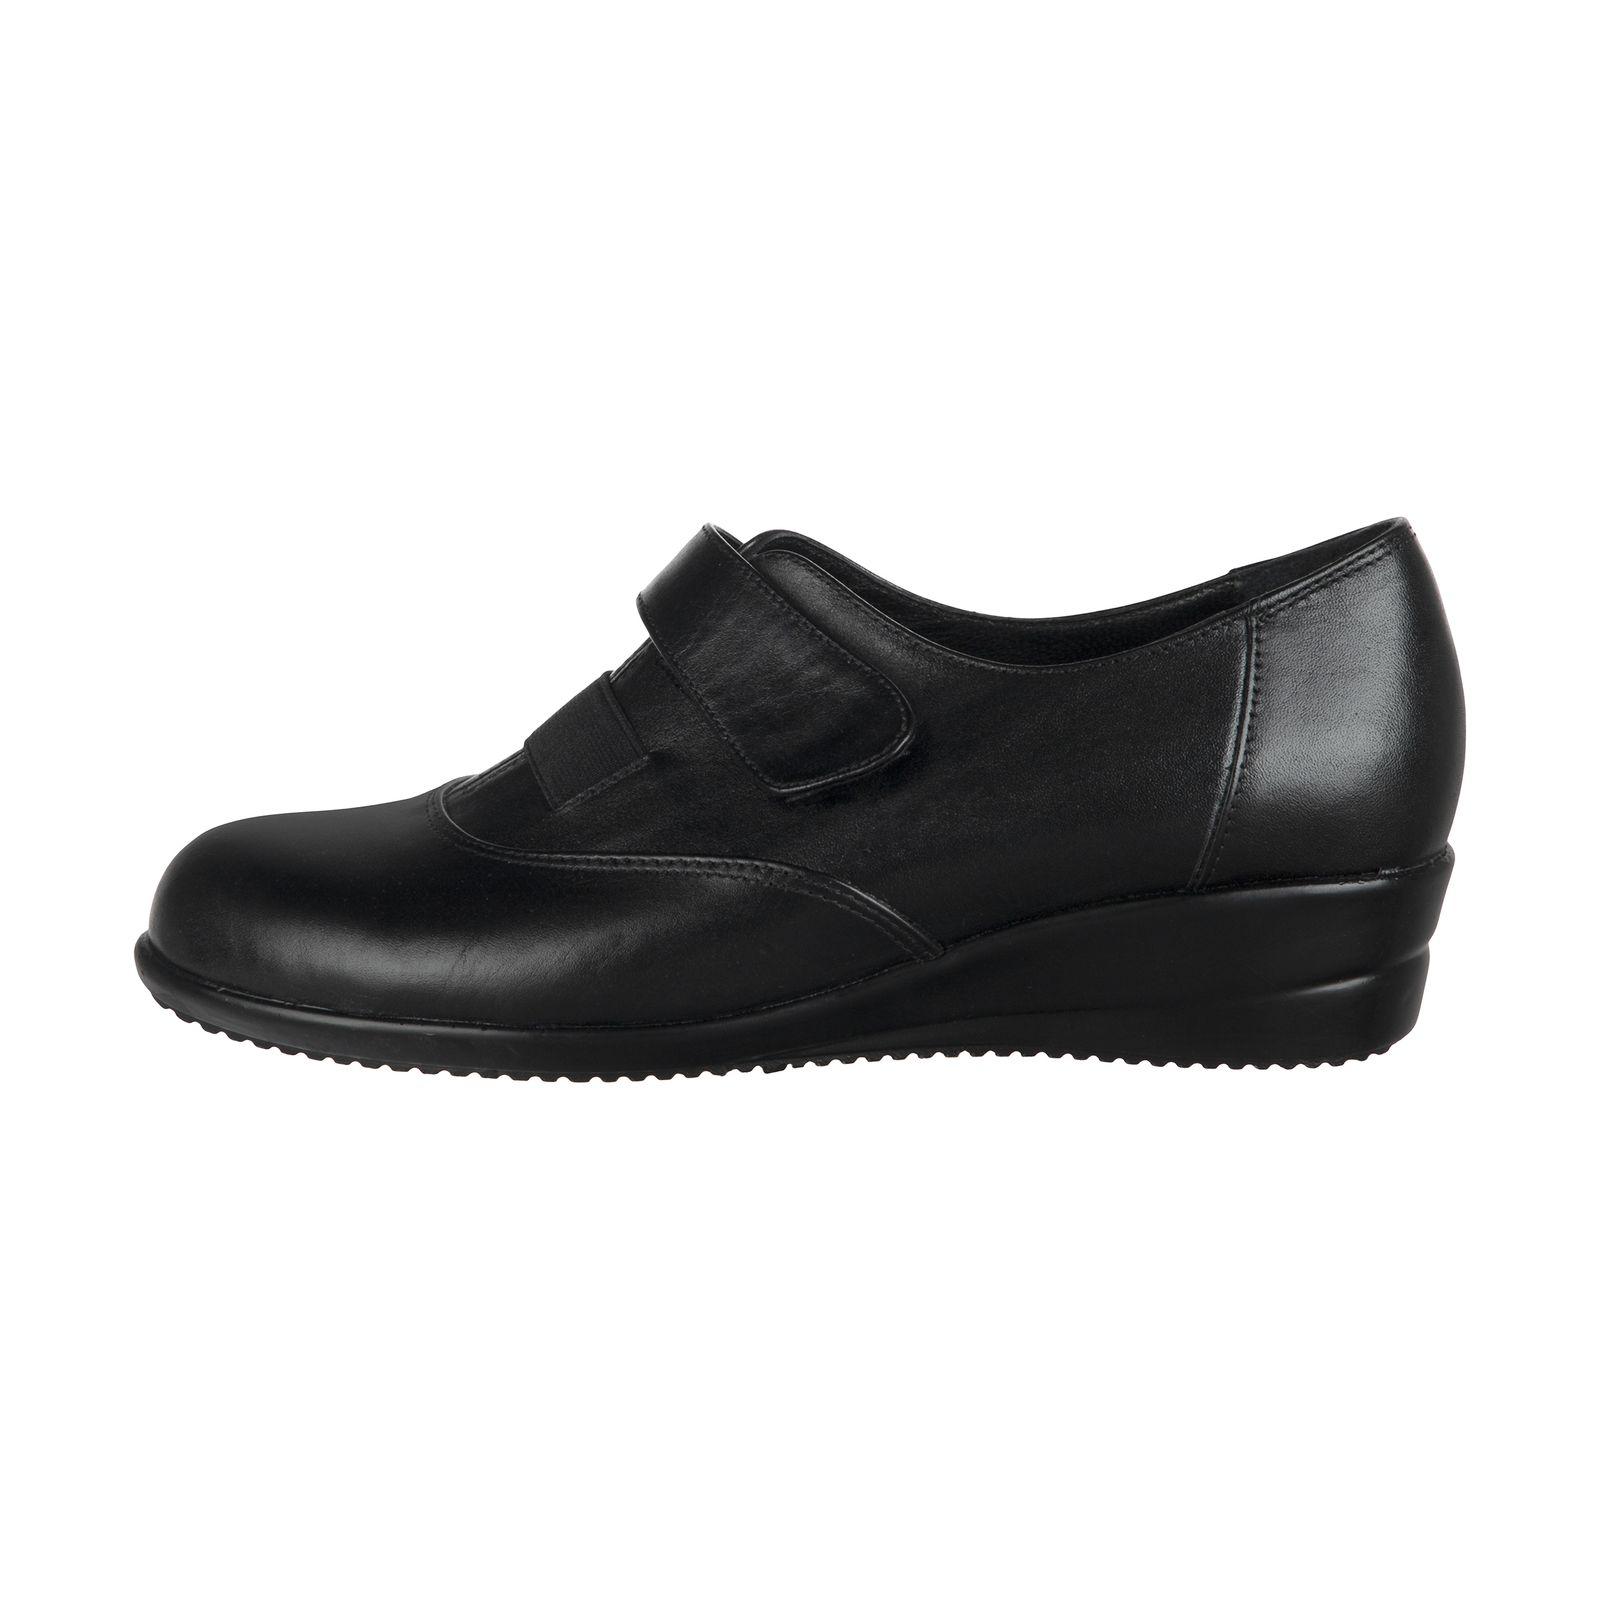 کفش روزمره زنانه سوته مدل 3070A500101 -  - 2